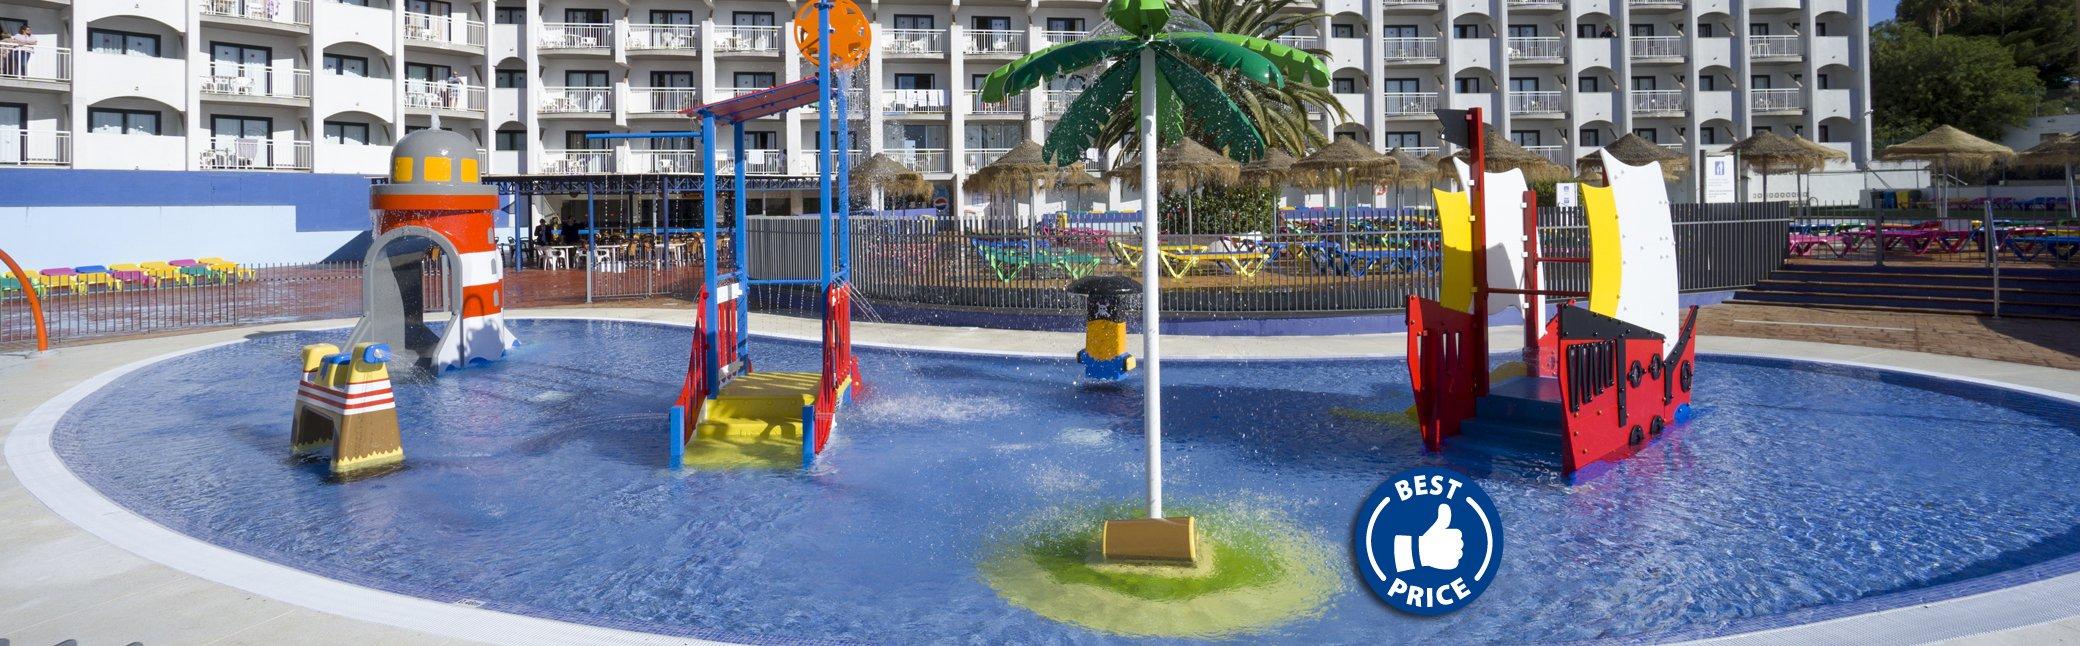 Hotel medplaya sito ufficiale hotel a salou hotel a benidorm hotel a torremolinos - Piscina laghetto playa prezzo ...